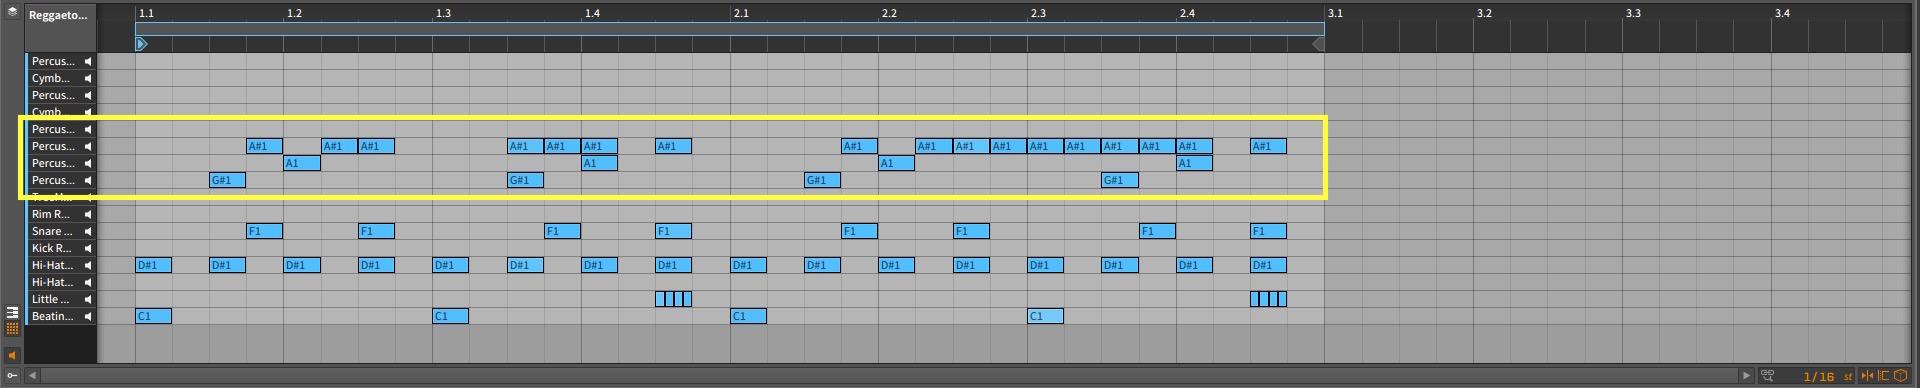 Bitwig Studio – Percussive Elements Arrangement [Percussion Chirk A, Percussion Chirk A]